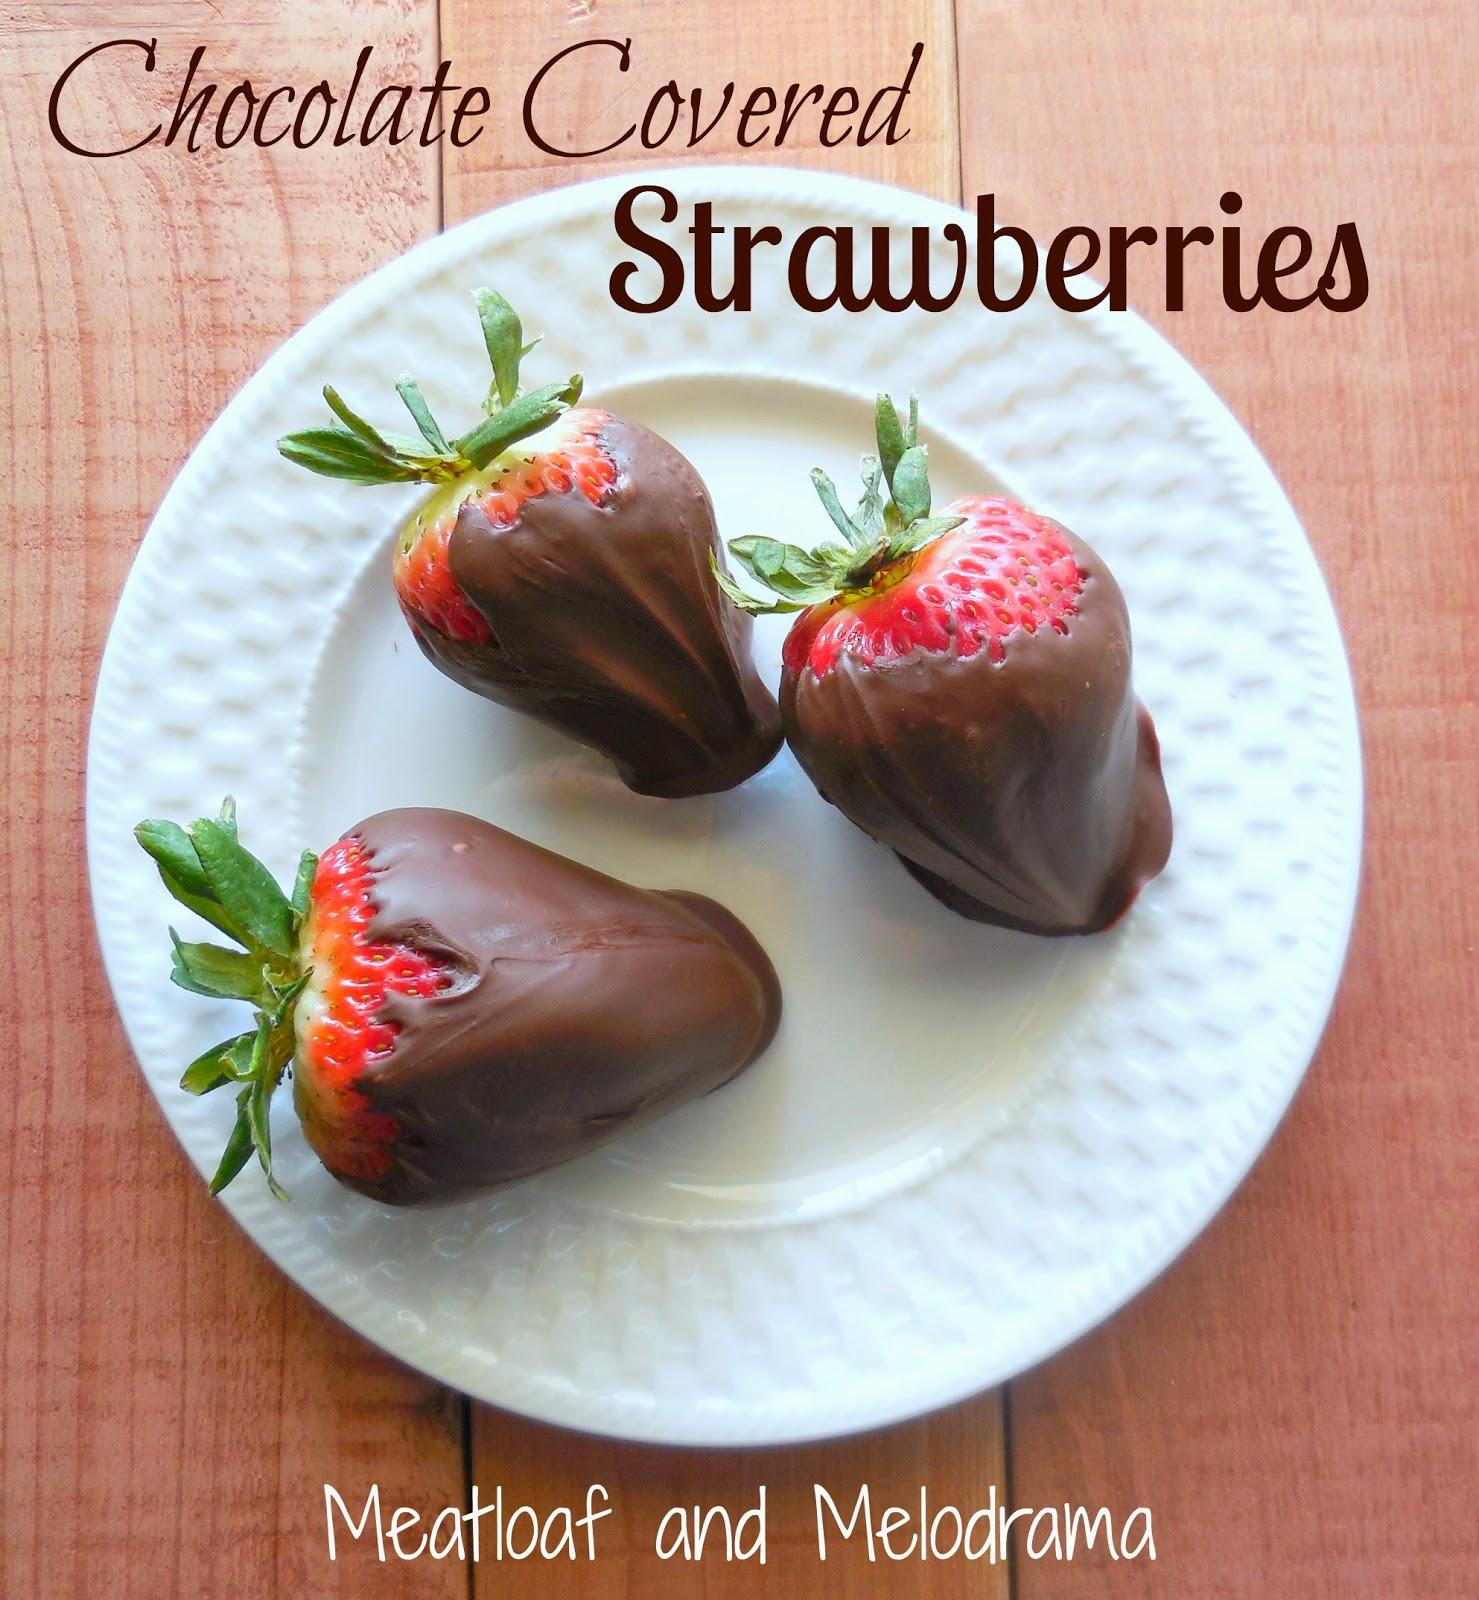 How Do U Make Chocolate Covered Strawberries At Home